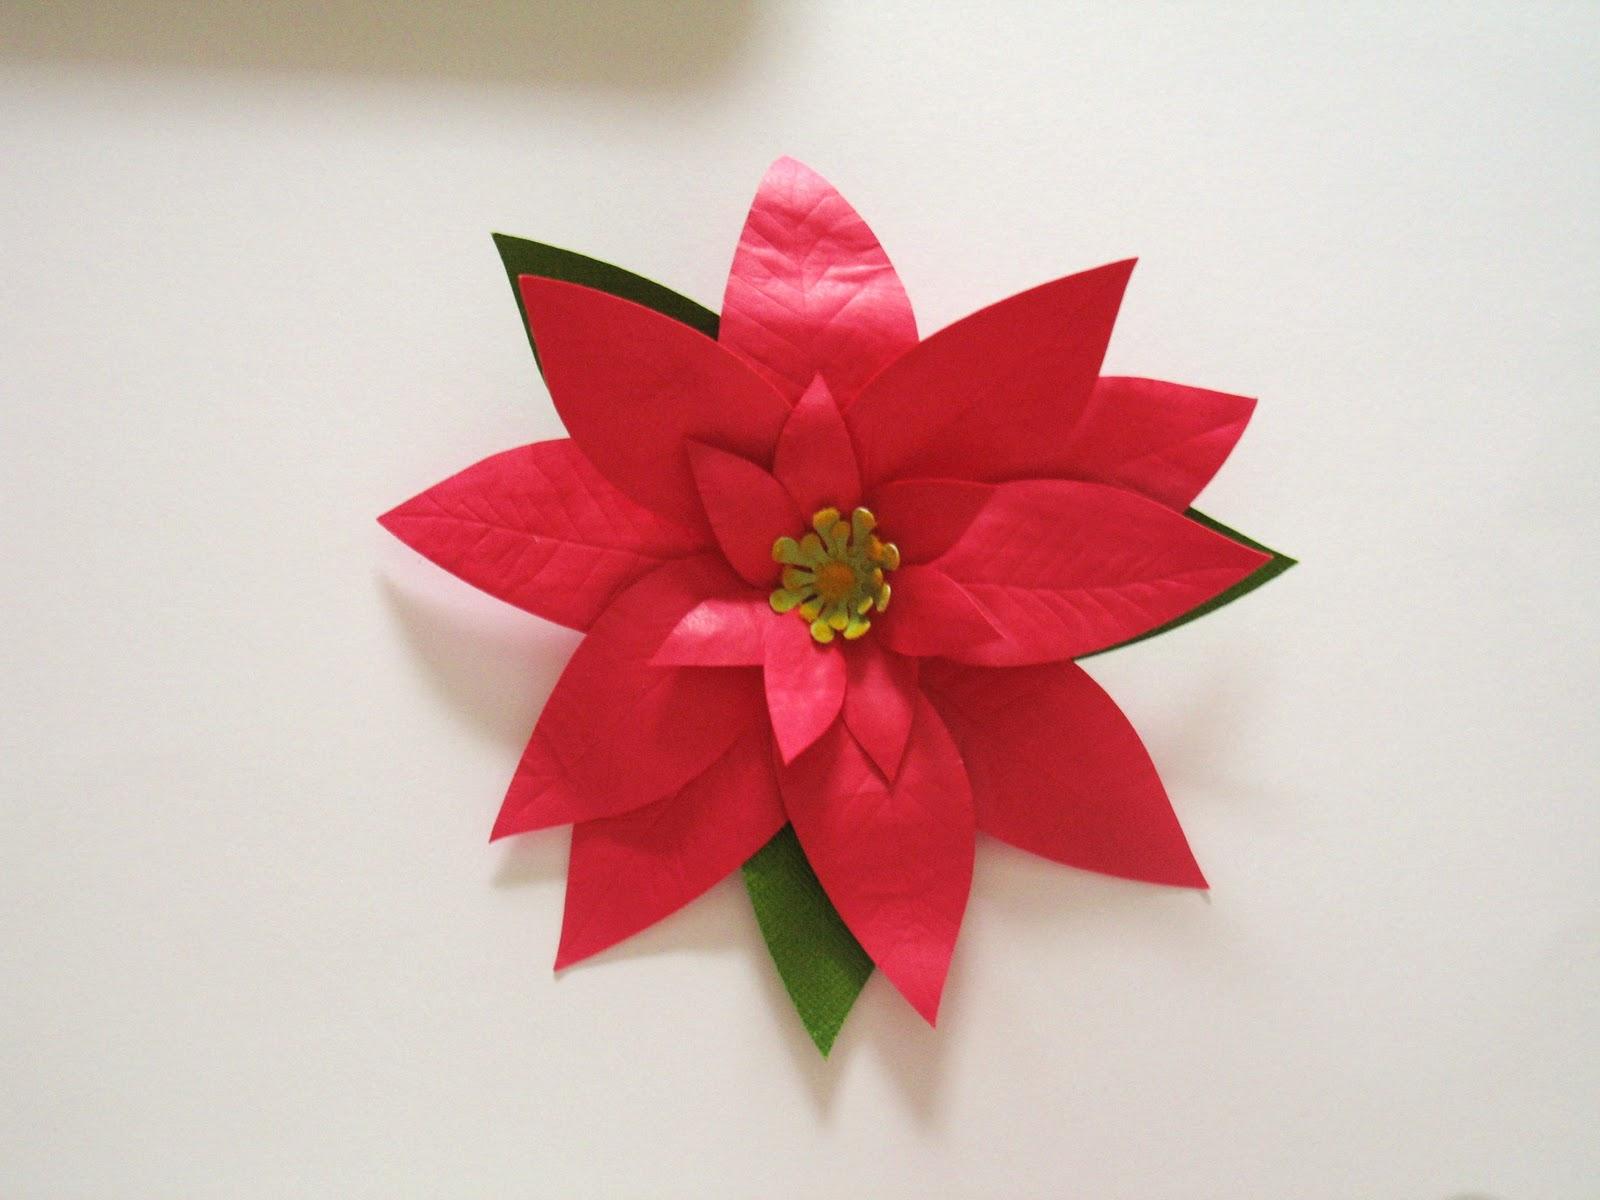 Zoe Bean Design Paper Poinsettias And Christmas Trees